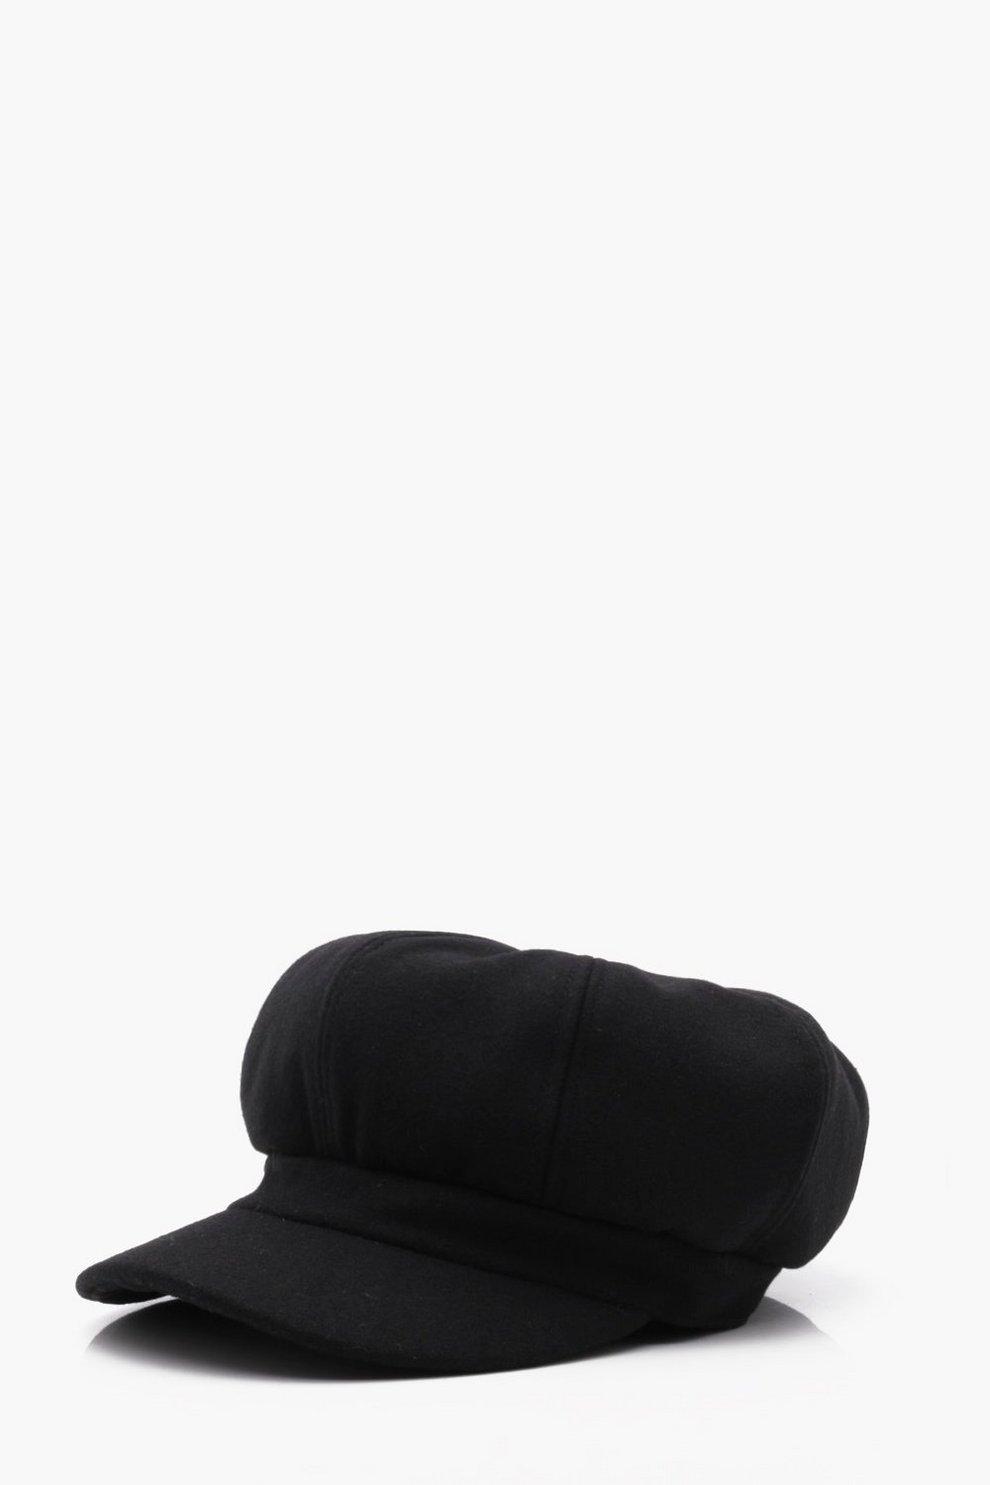 Brushed Baker Boy Hat  b54bcf984b4